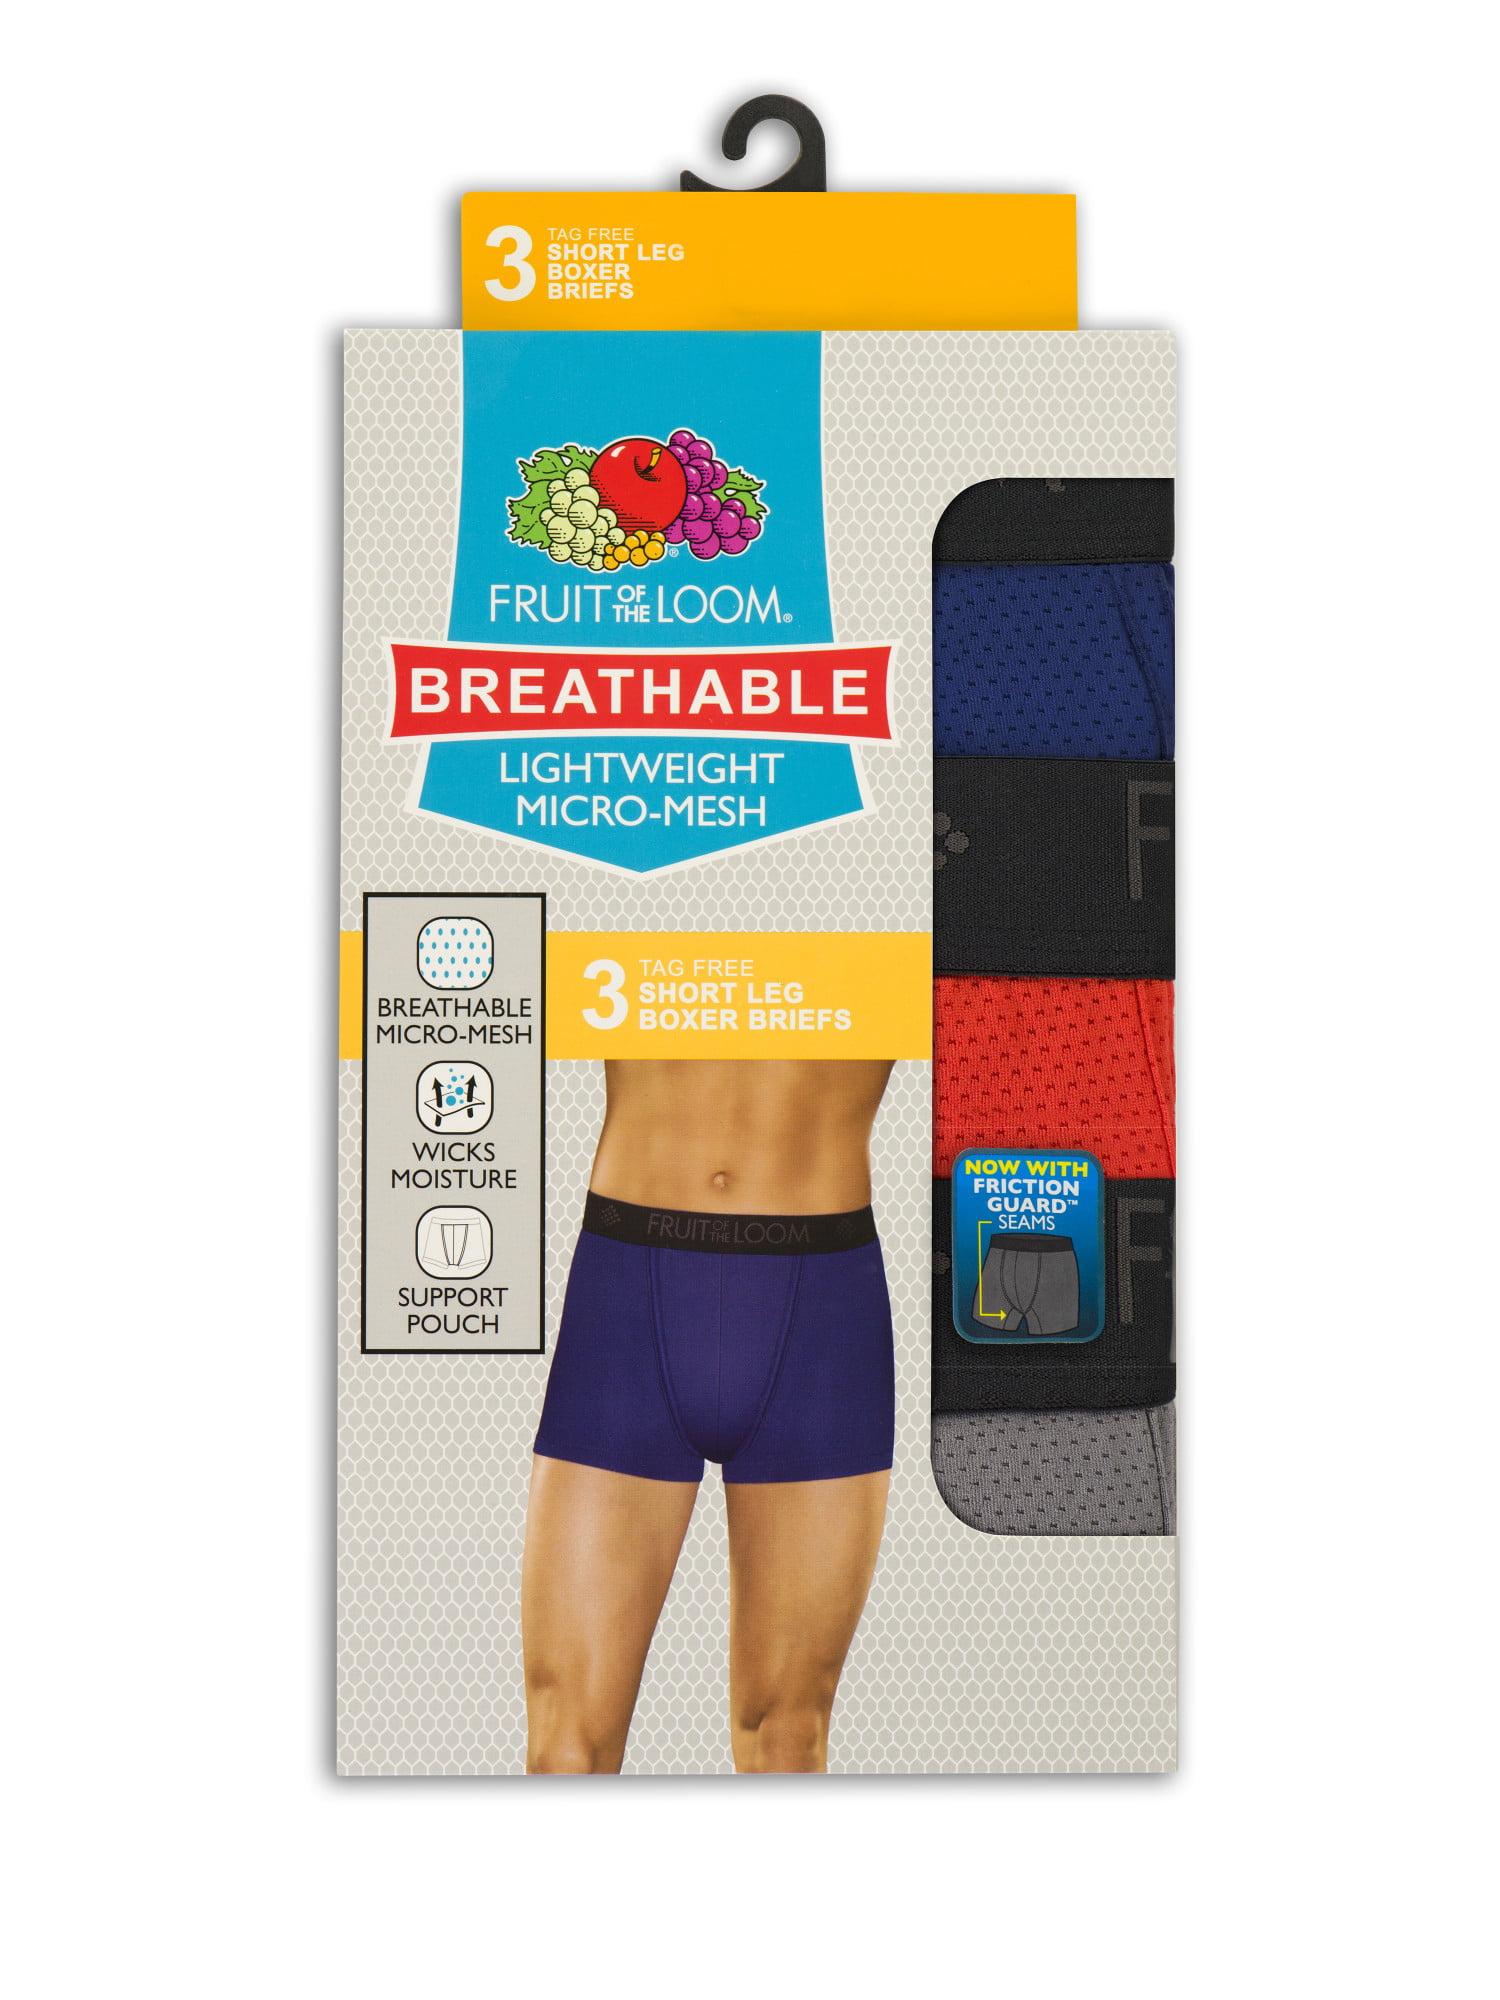 a4fc013d330f Fruit of the Loom - Men's Breathable Lightweight Micro-Mesh Short Leg Boxer  Briefs, 3 Pack - Walmart.com